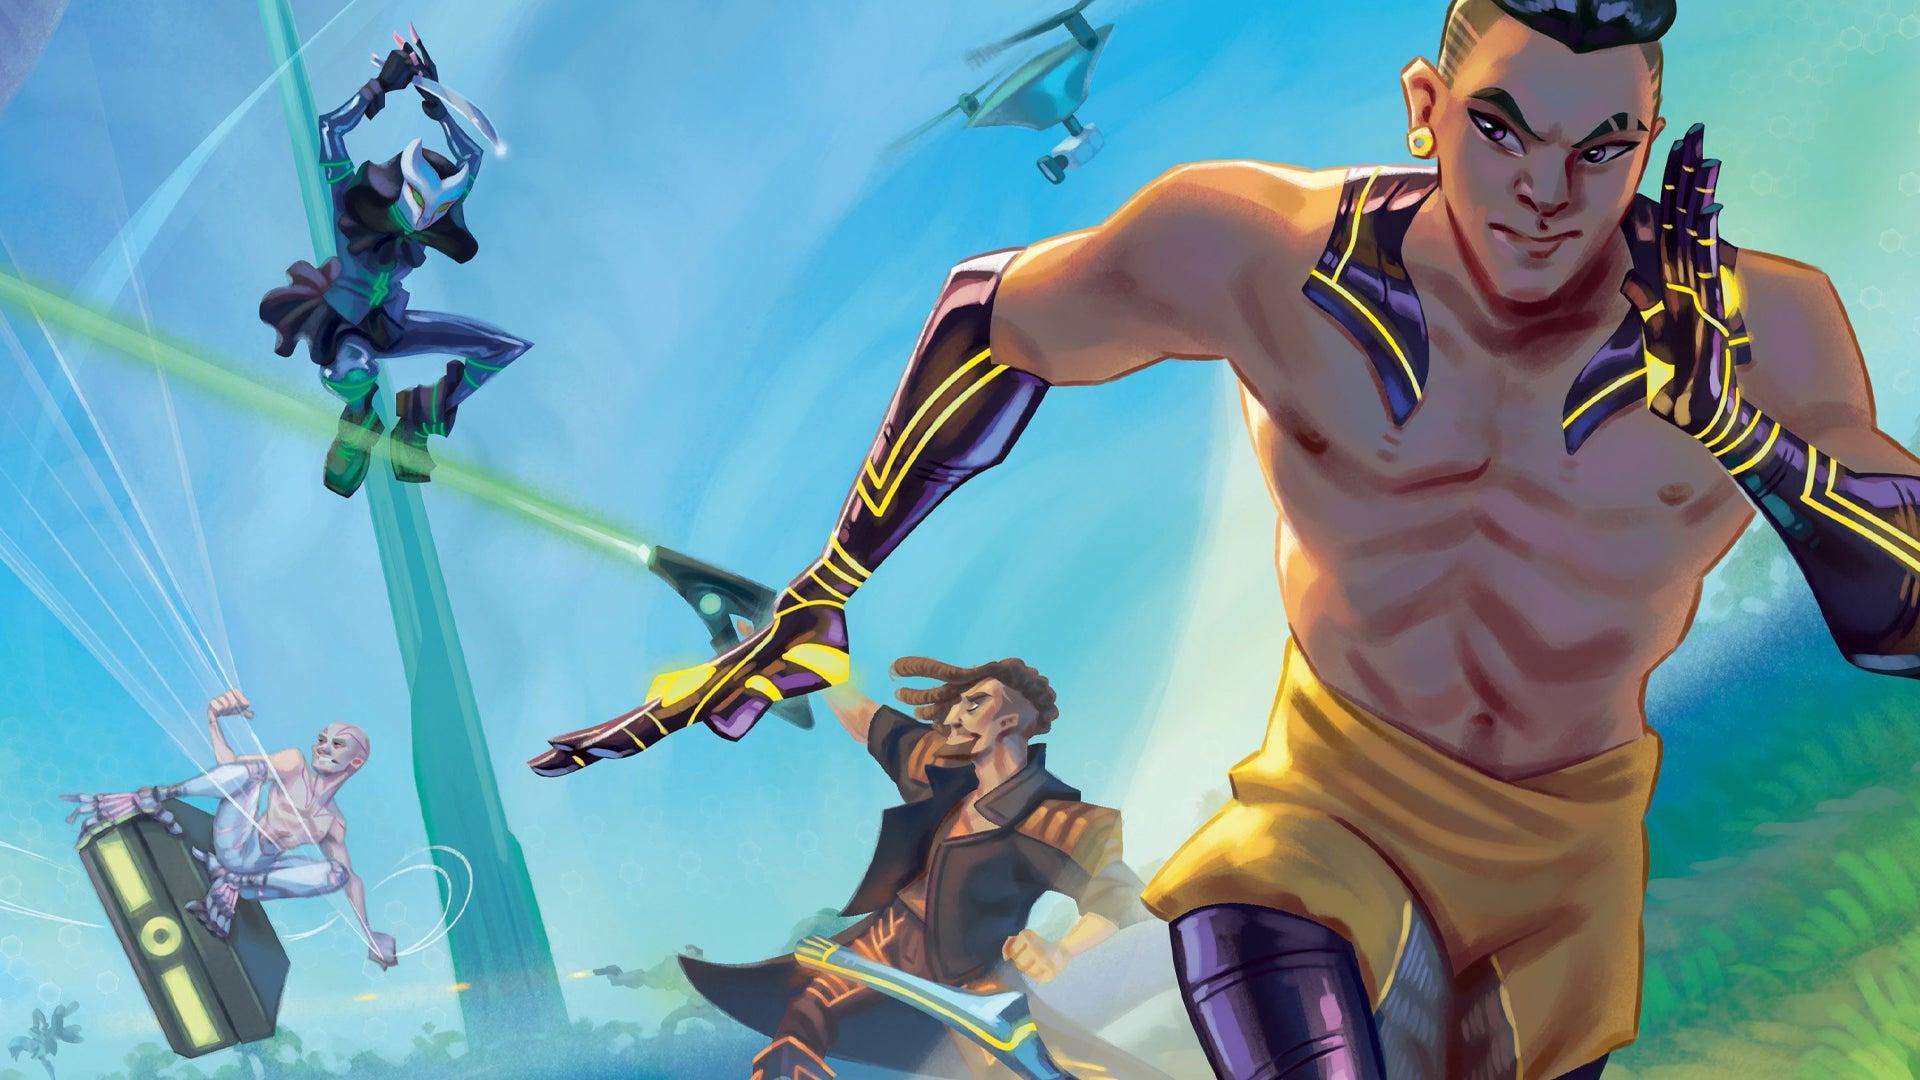 Image for Battle royale board game Reload sounds like a tabletop Fortnite